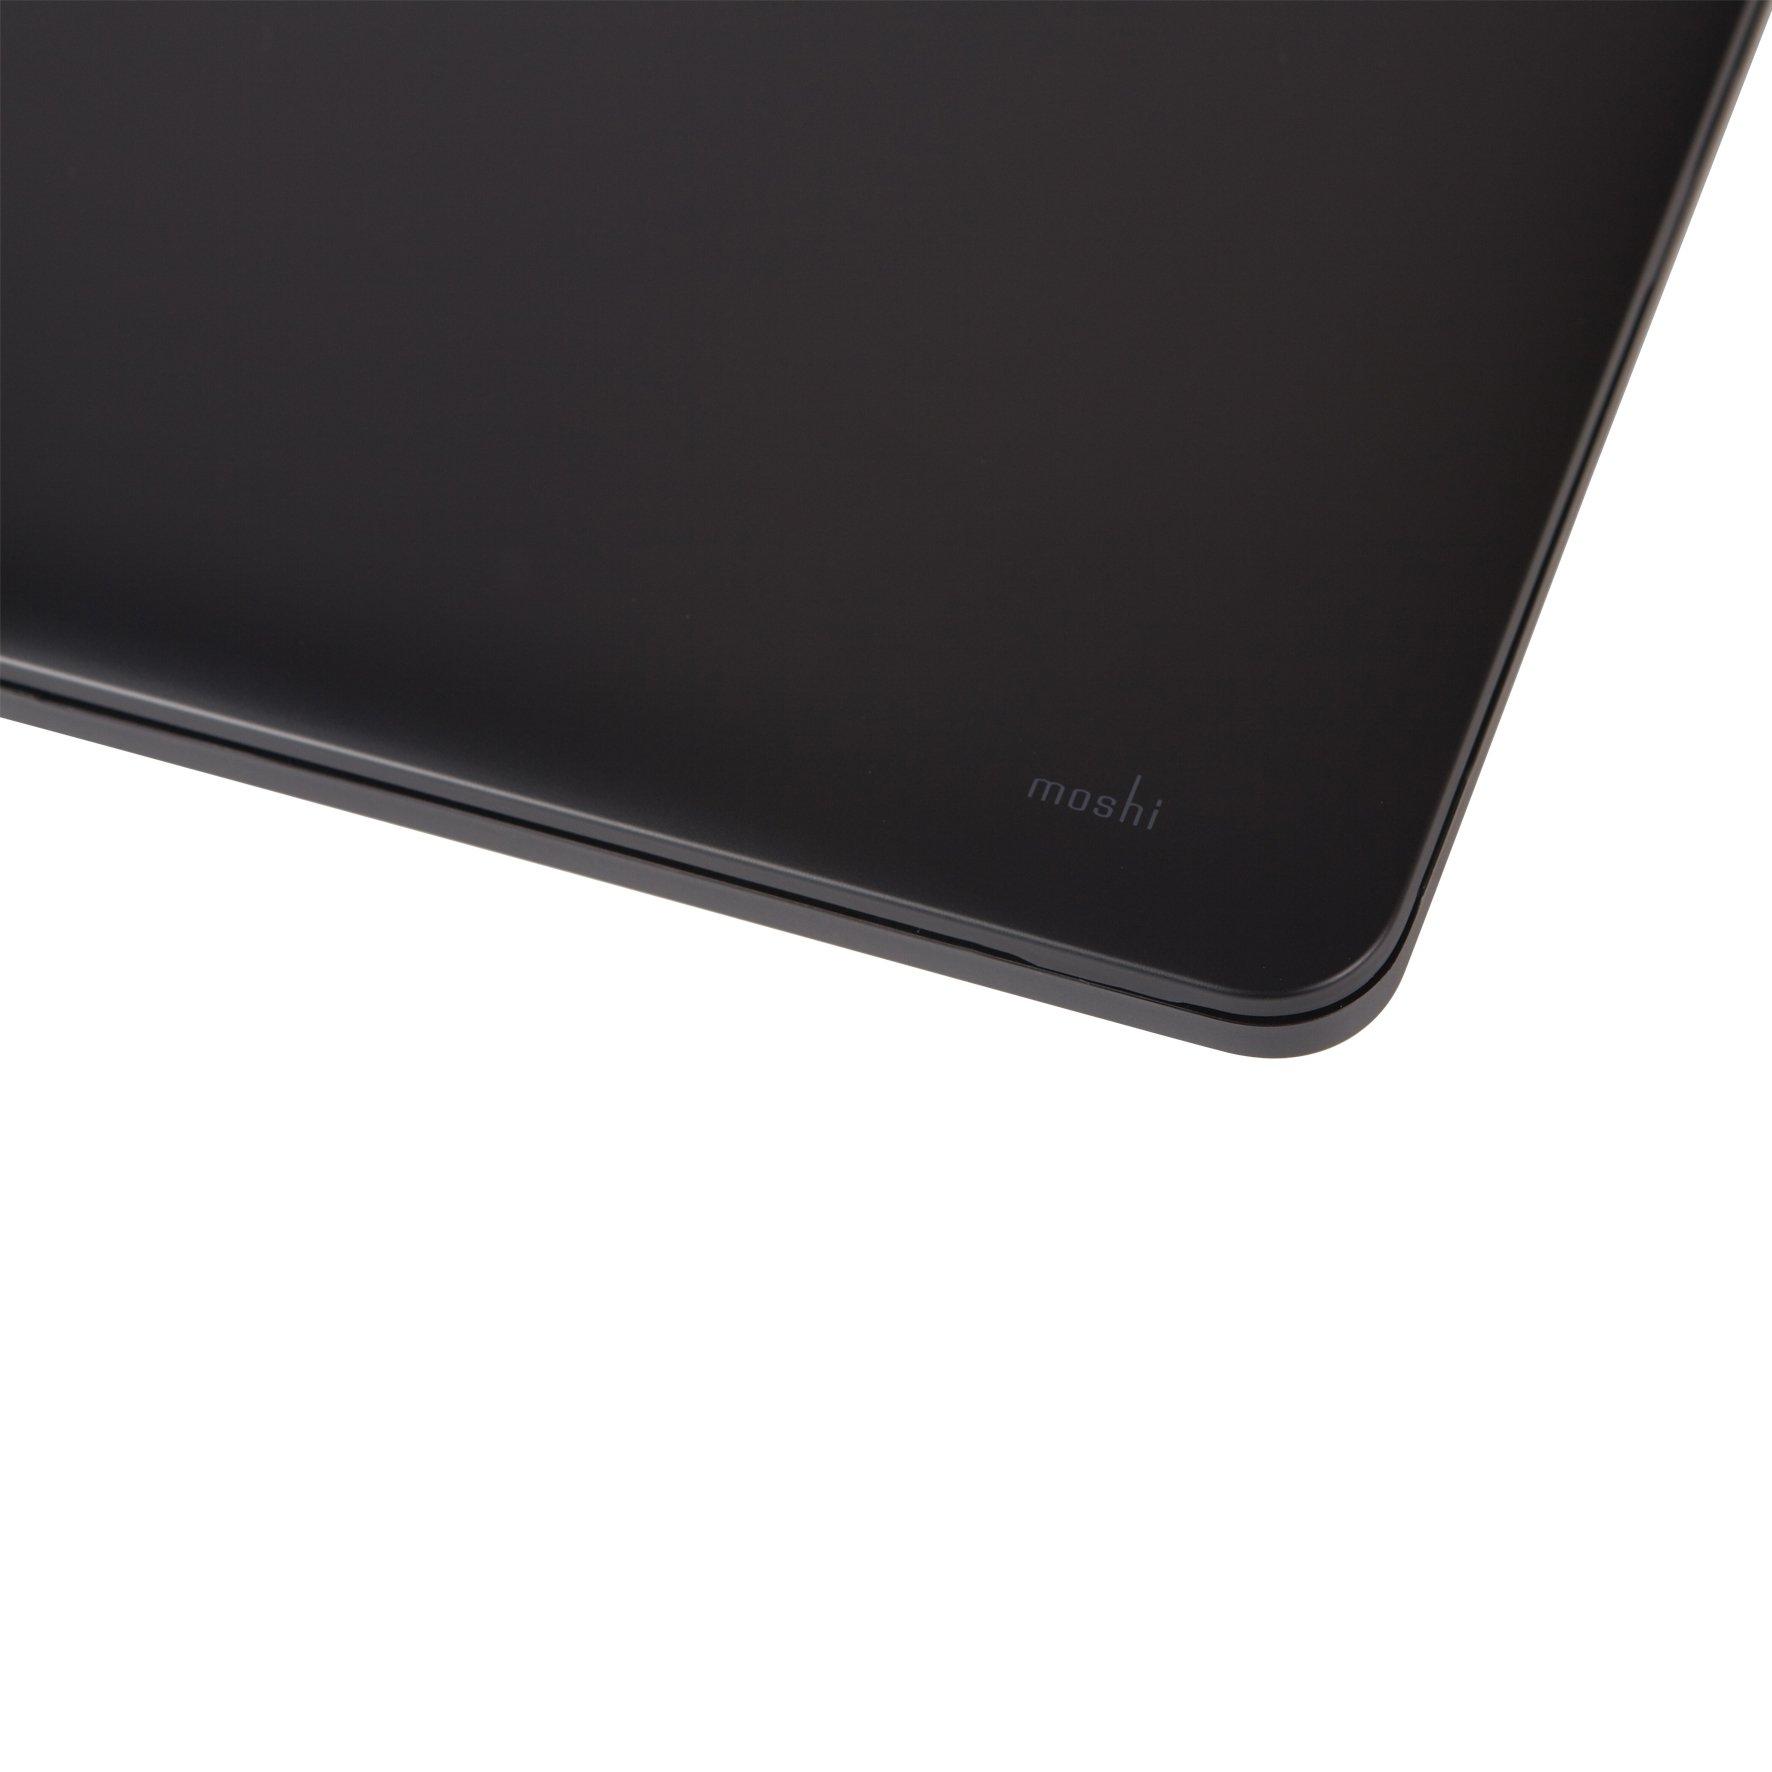 Moshi iGlaze Hard Case for MacBook Pro Retina 15'' (2012-2015) (Stealth Black) by Moshi (Image #4)